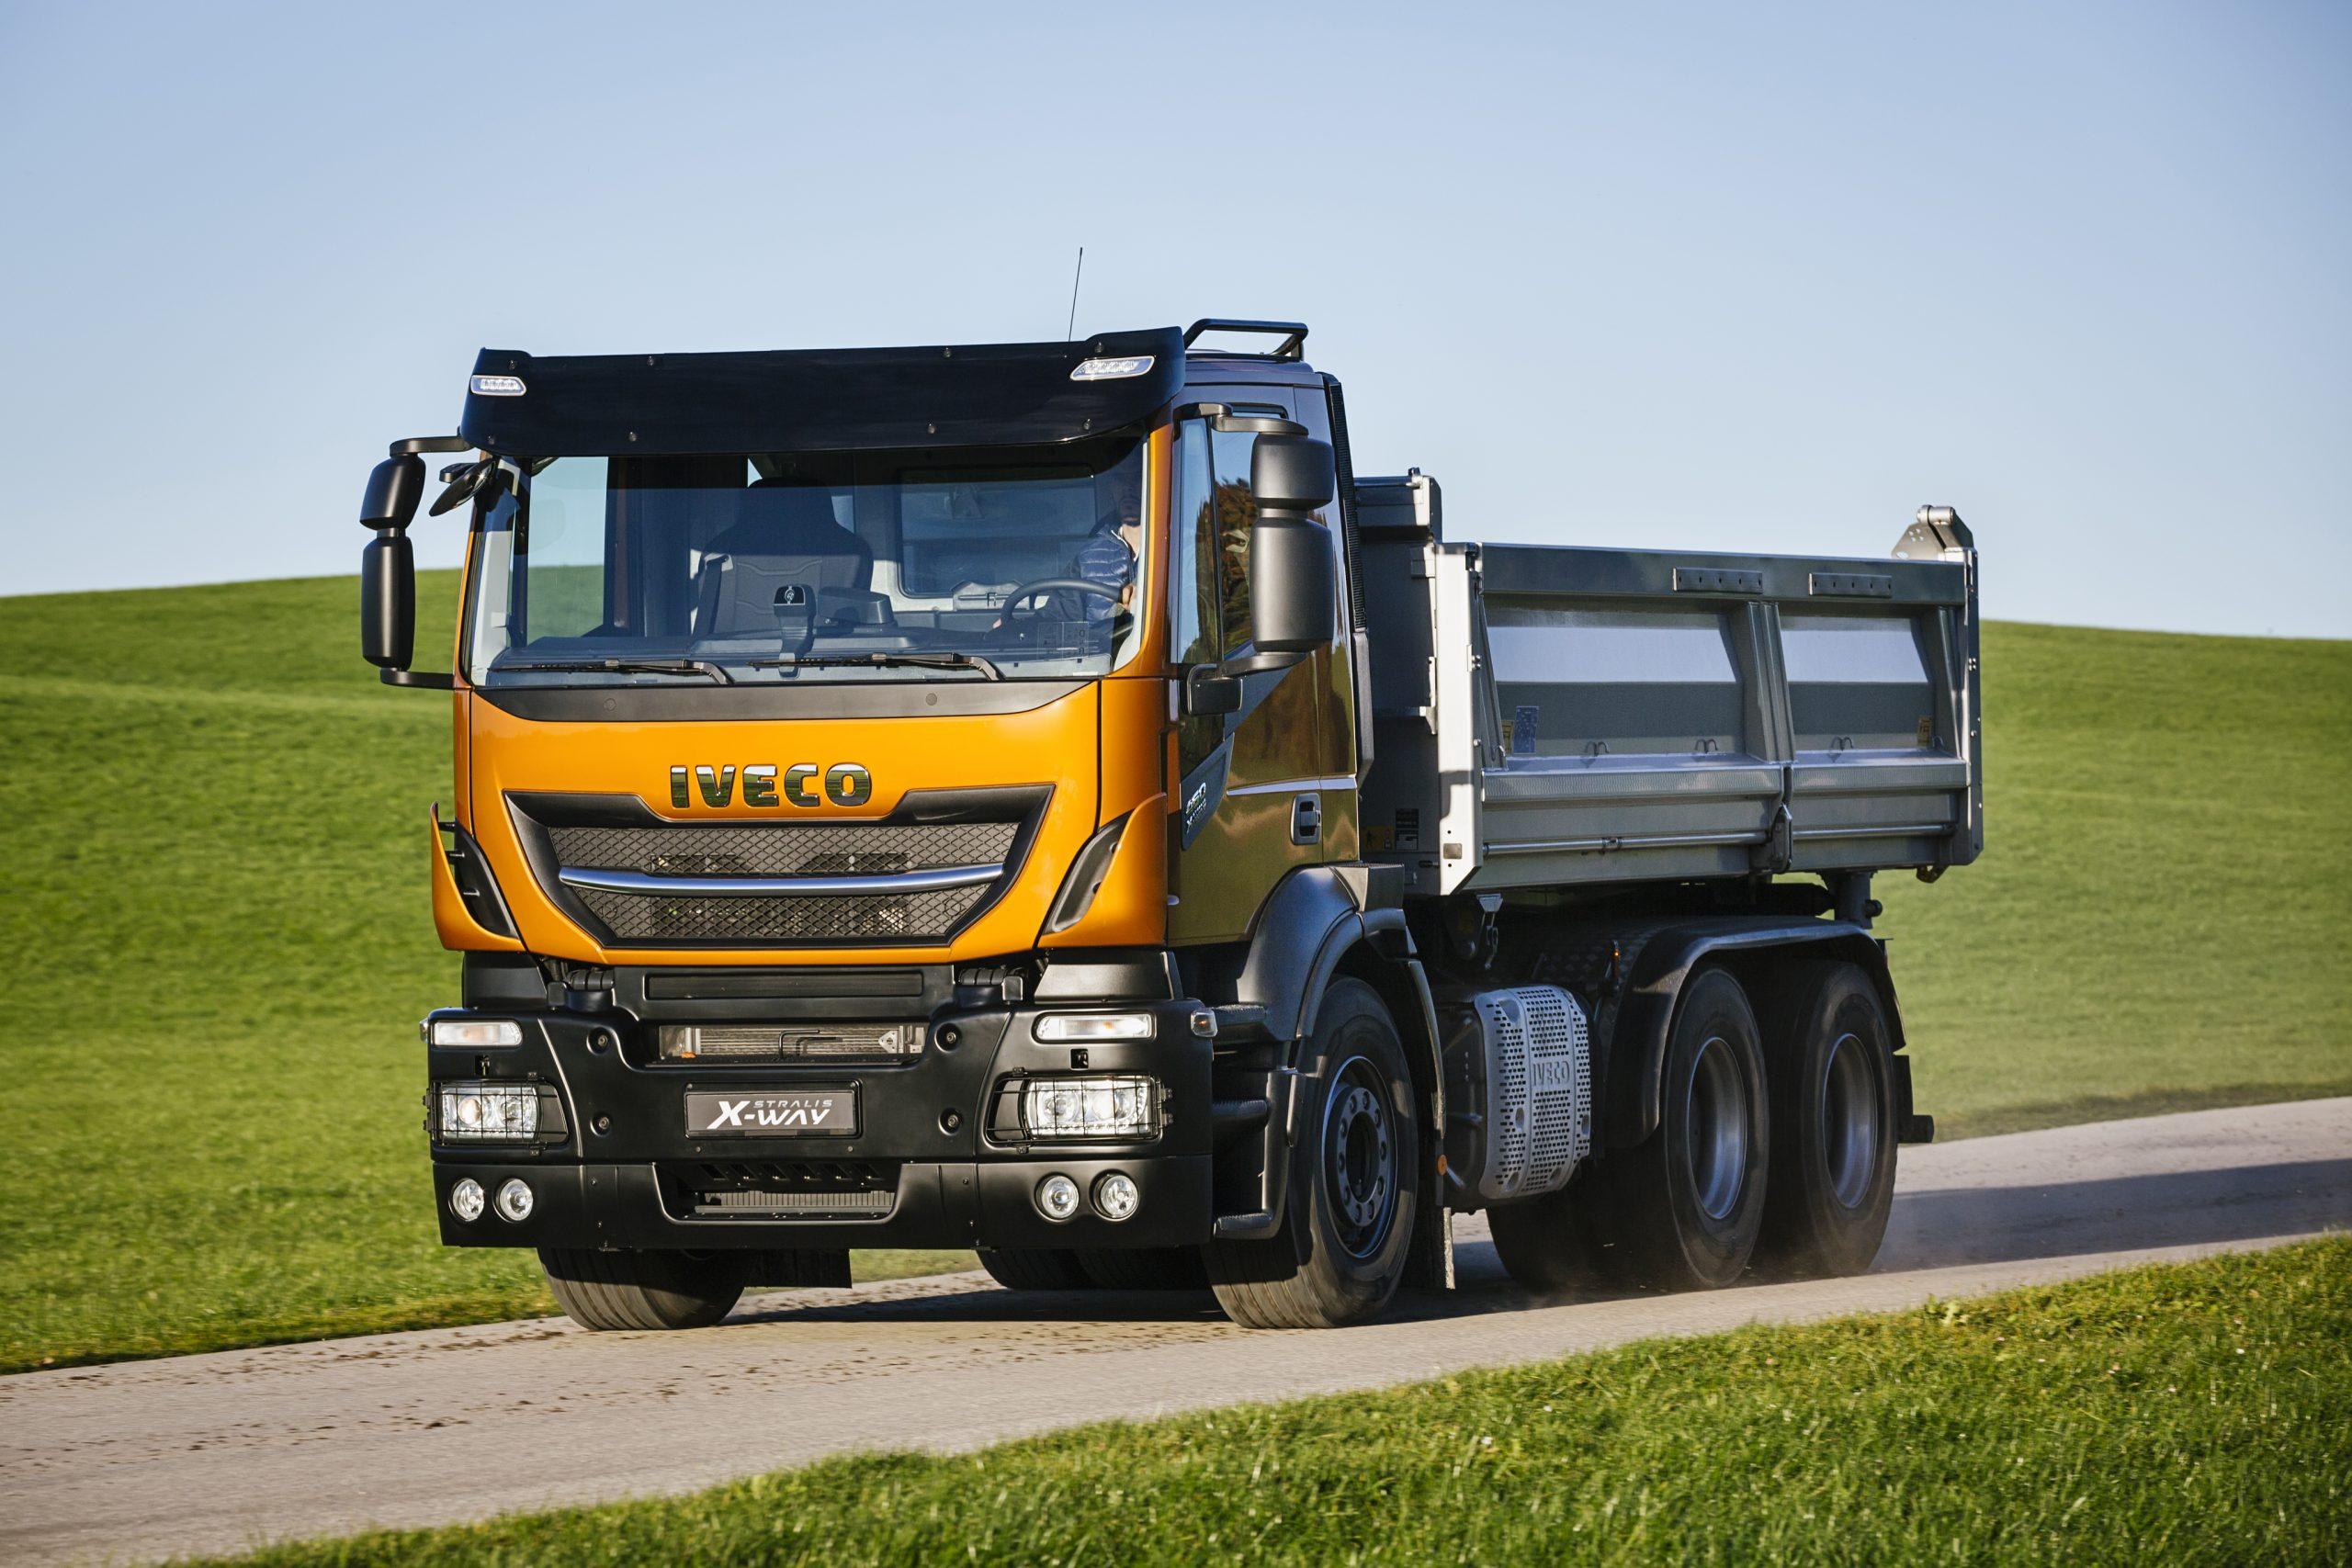 По каким характеристикам выбрать грузовик?